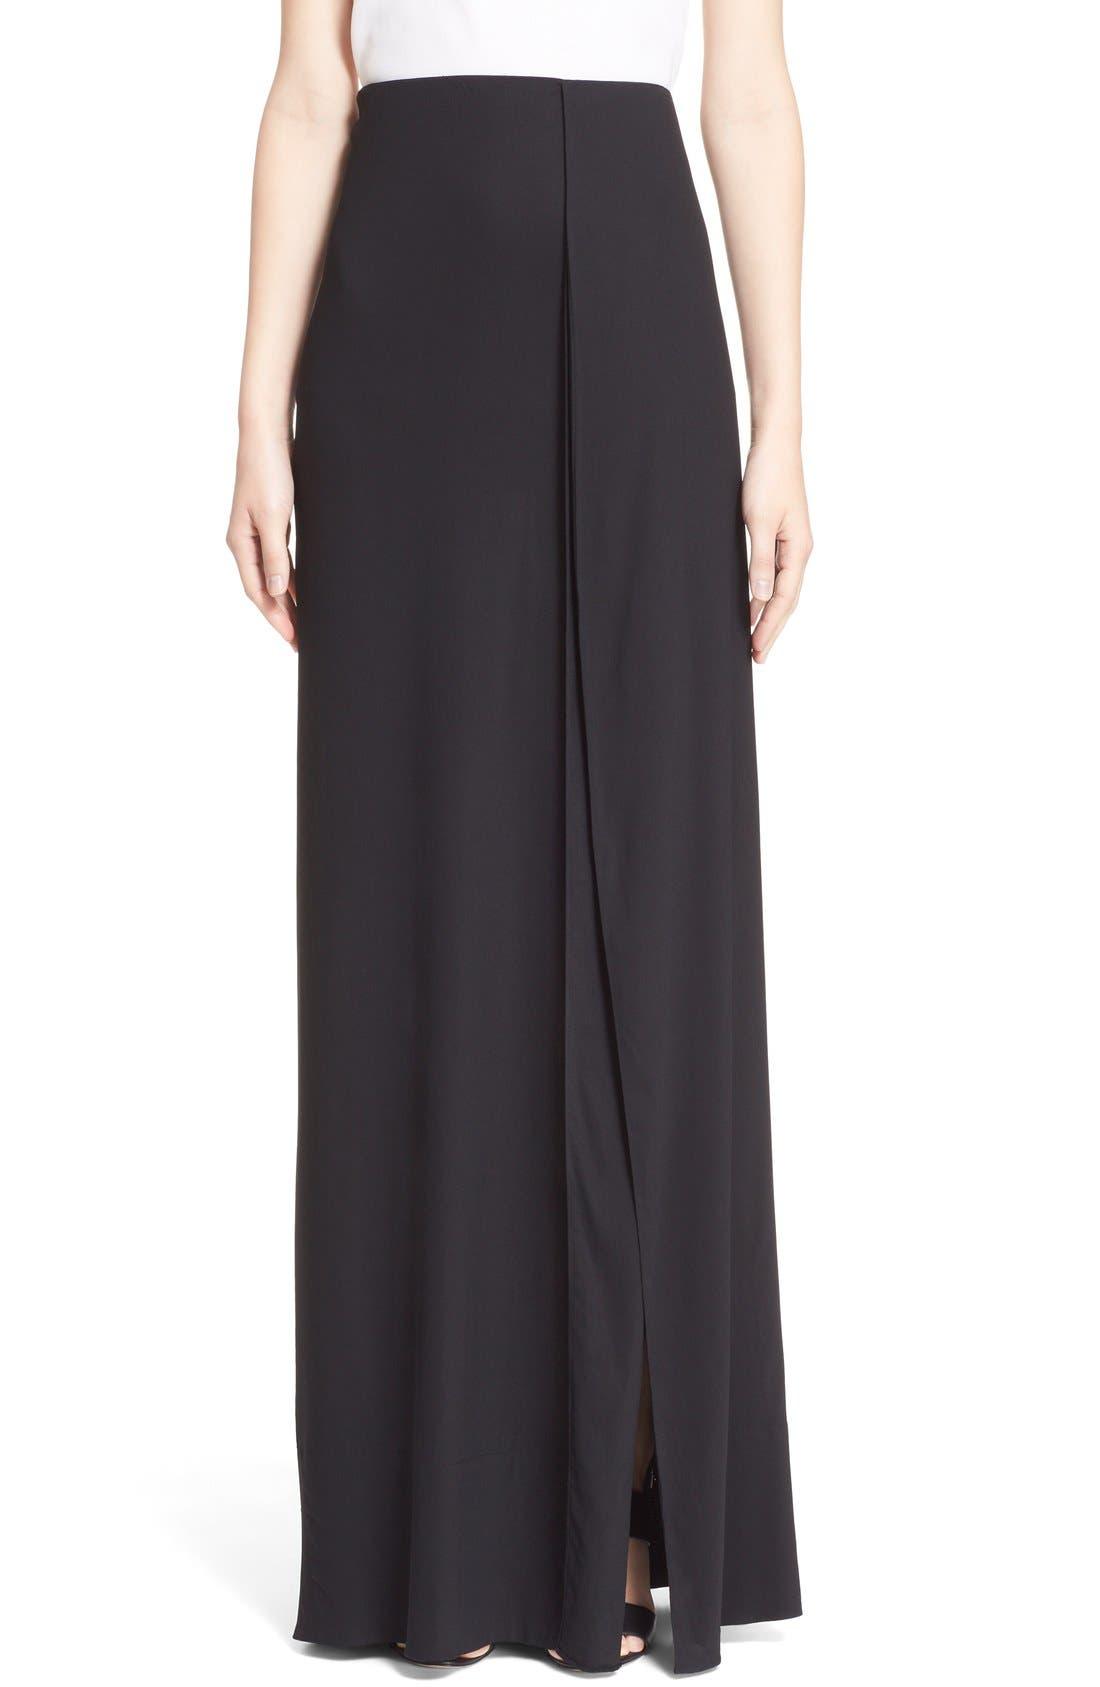 Alternate Image 1 Selected - Donna Karan New York Crepe Flutter Maxi Skirt